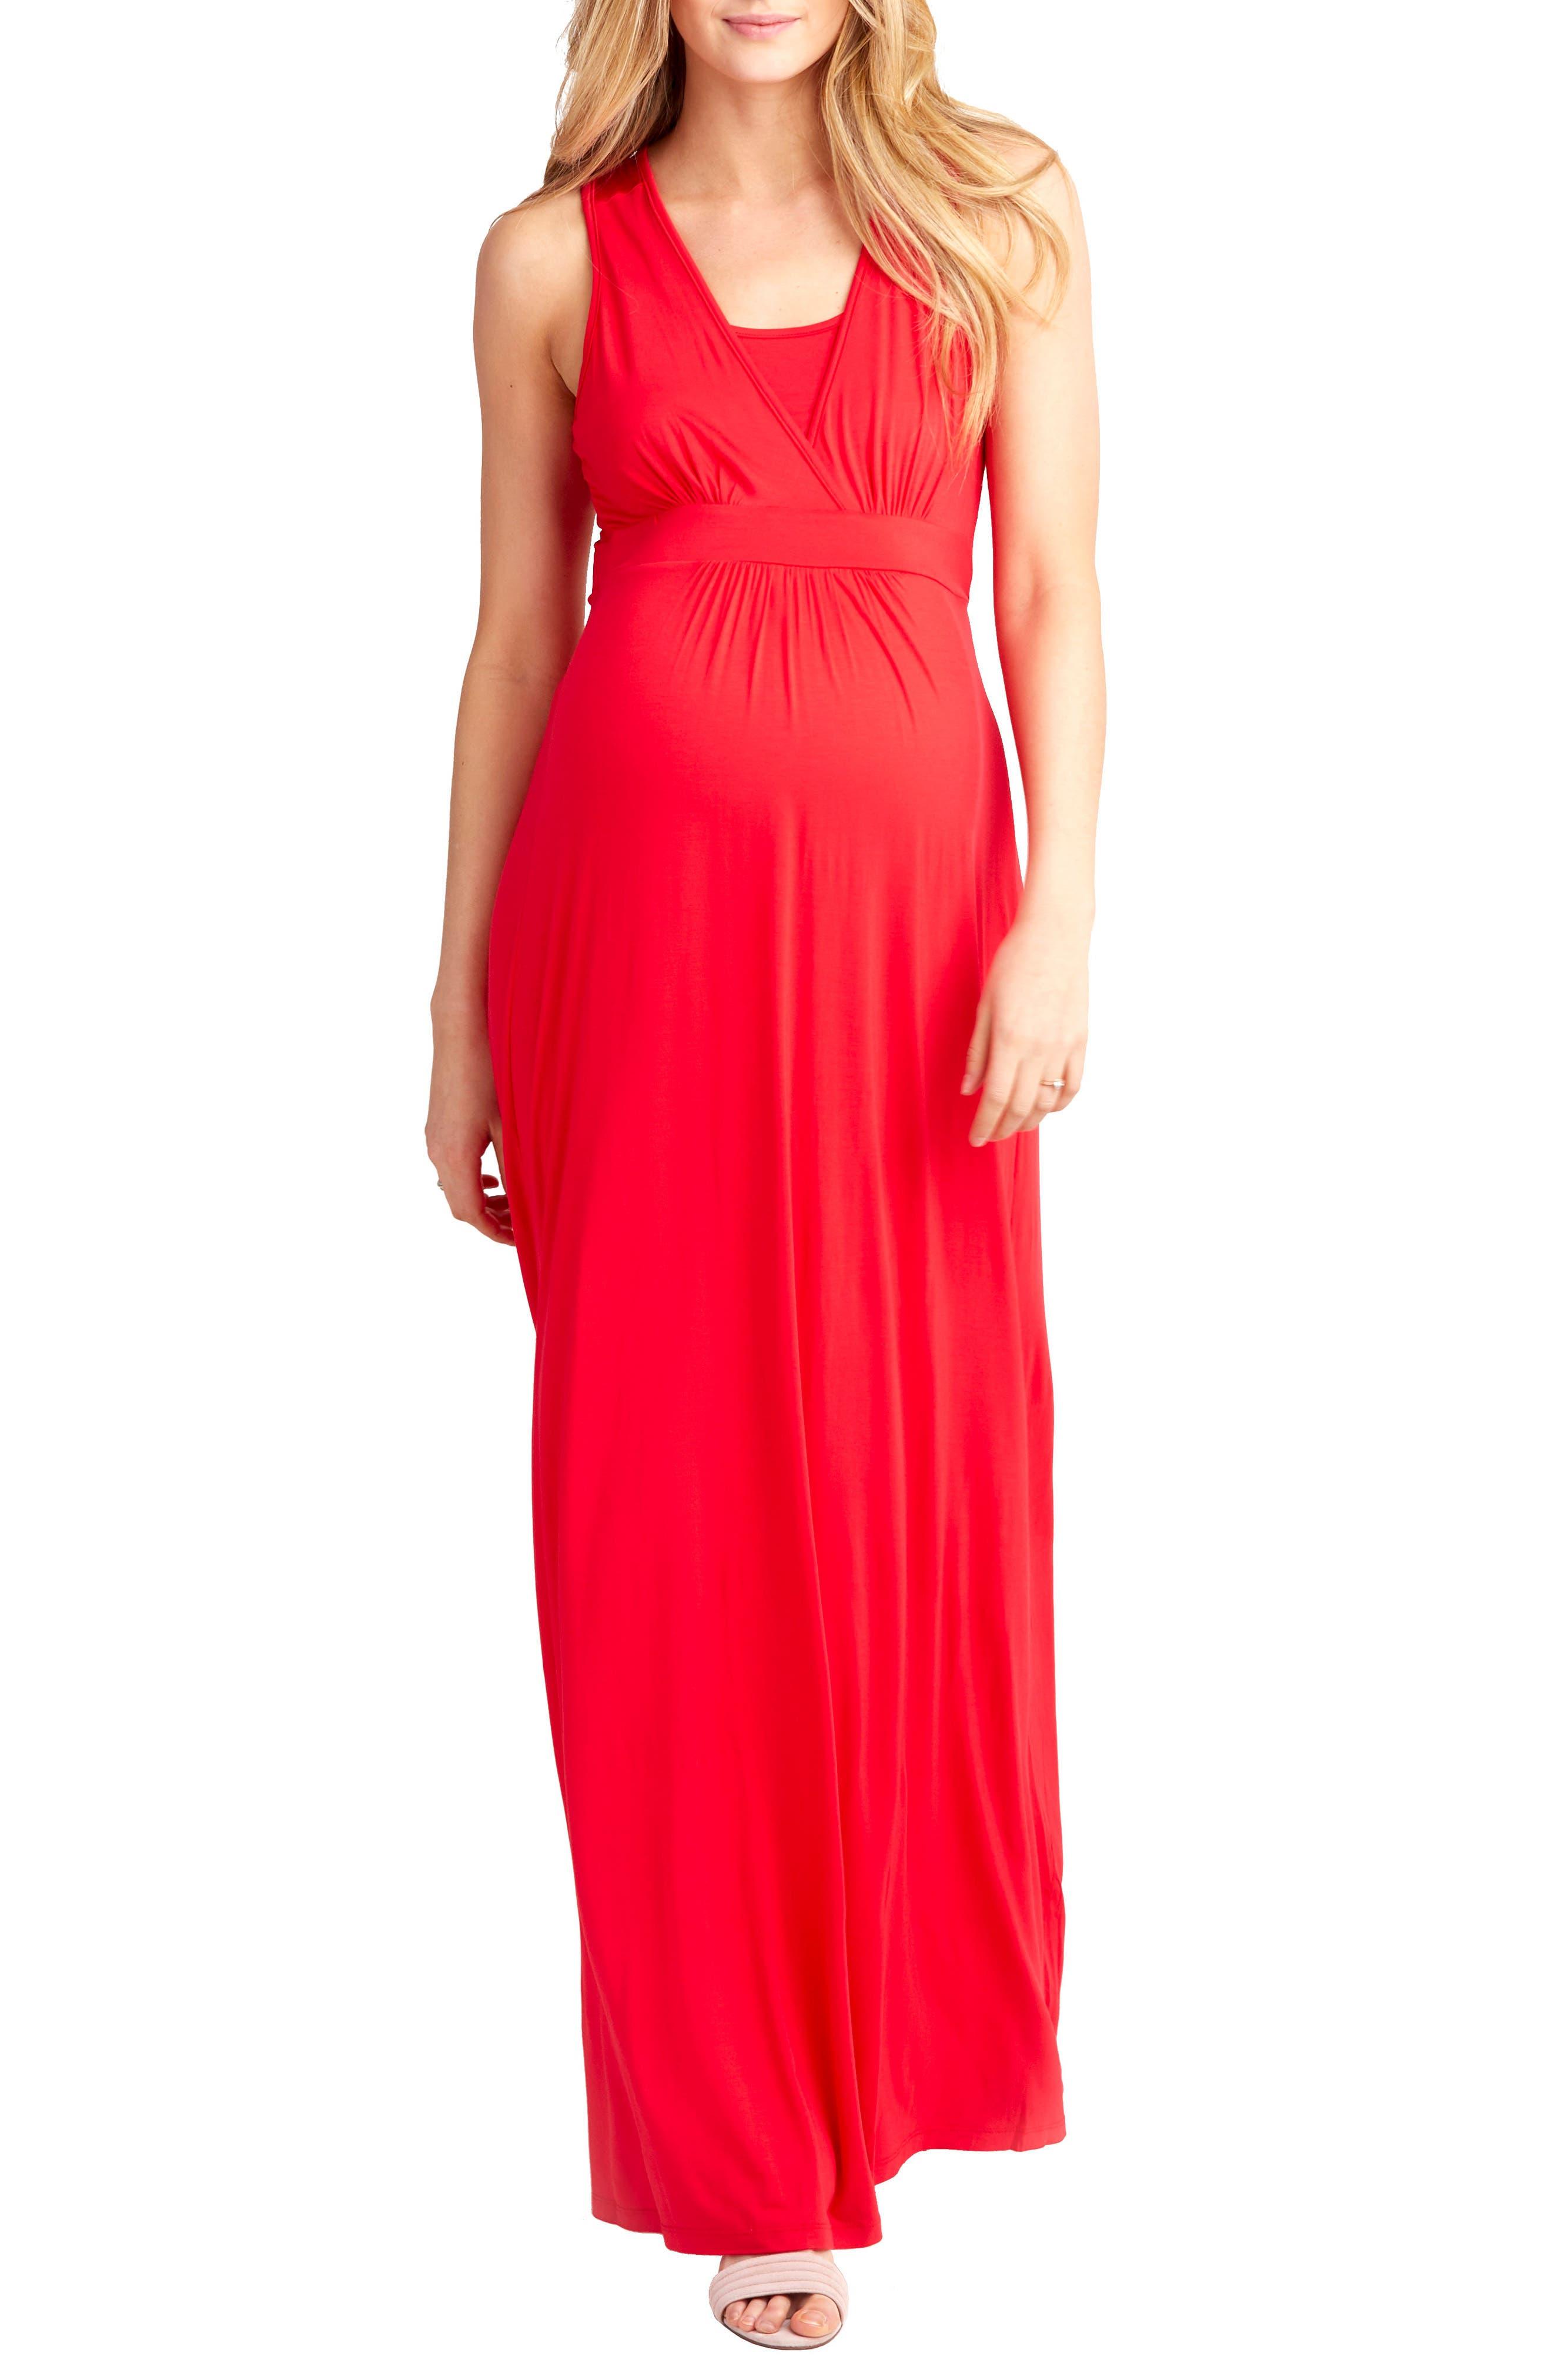 Nom Maternity Hollis Maternity/nursing Maxi Dress, Red